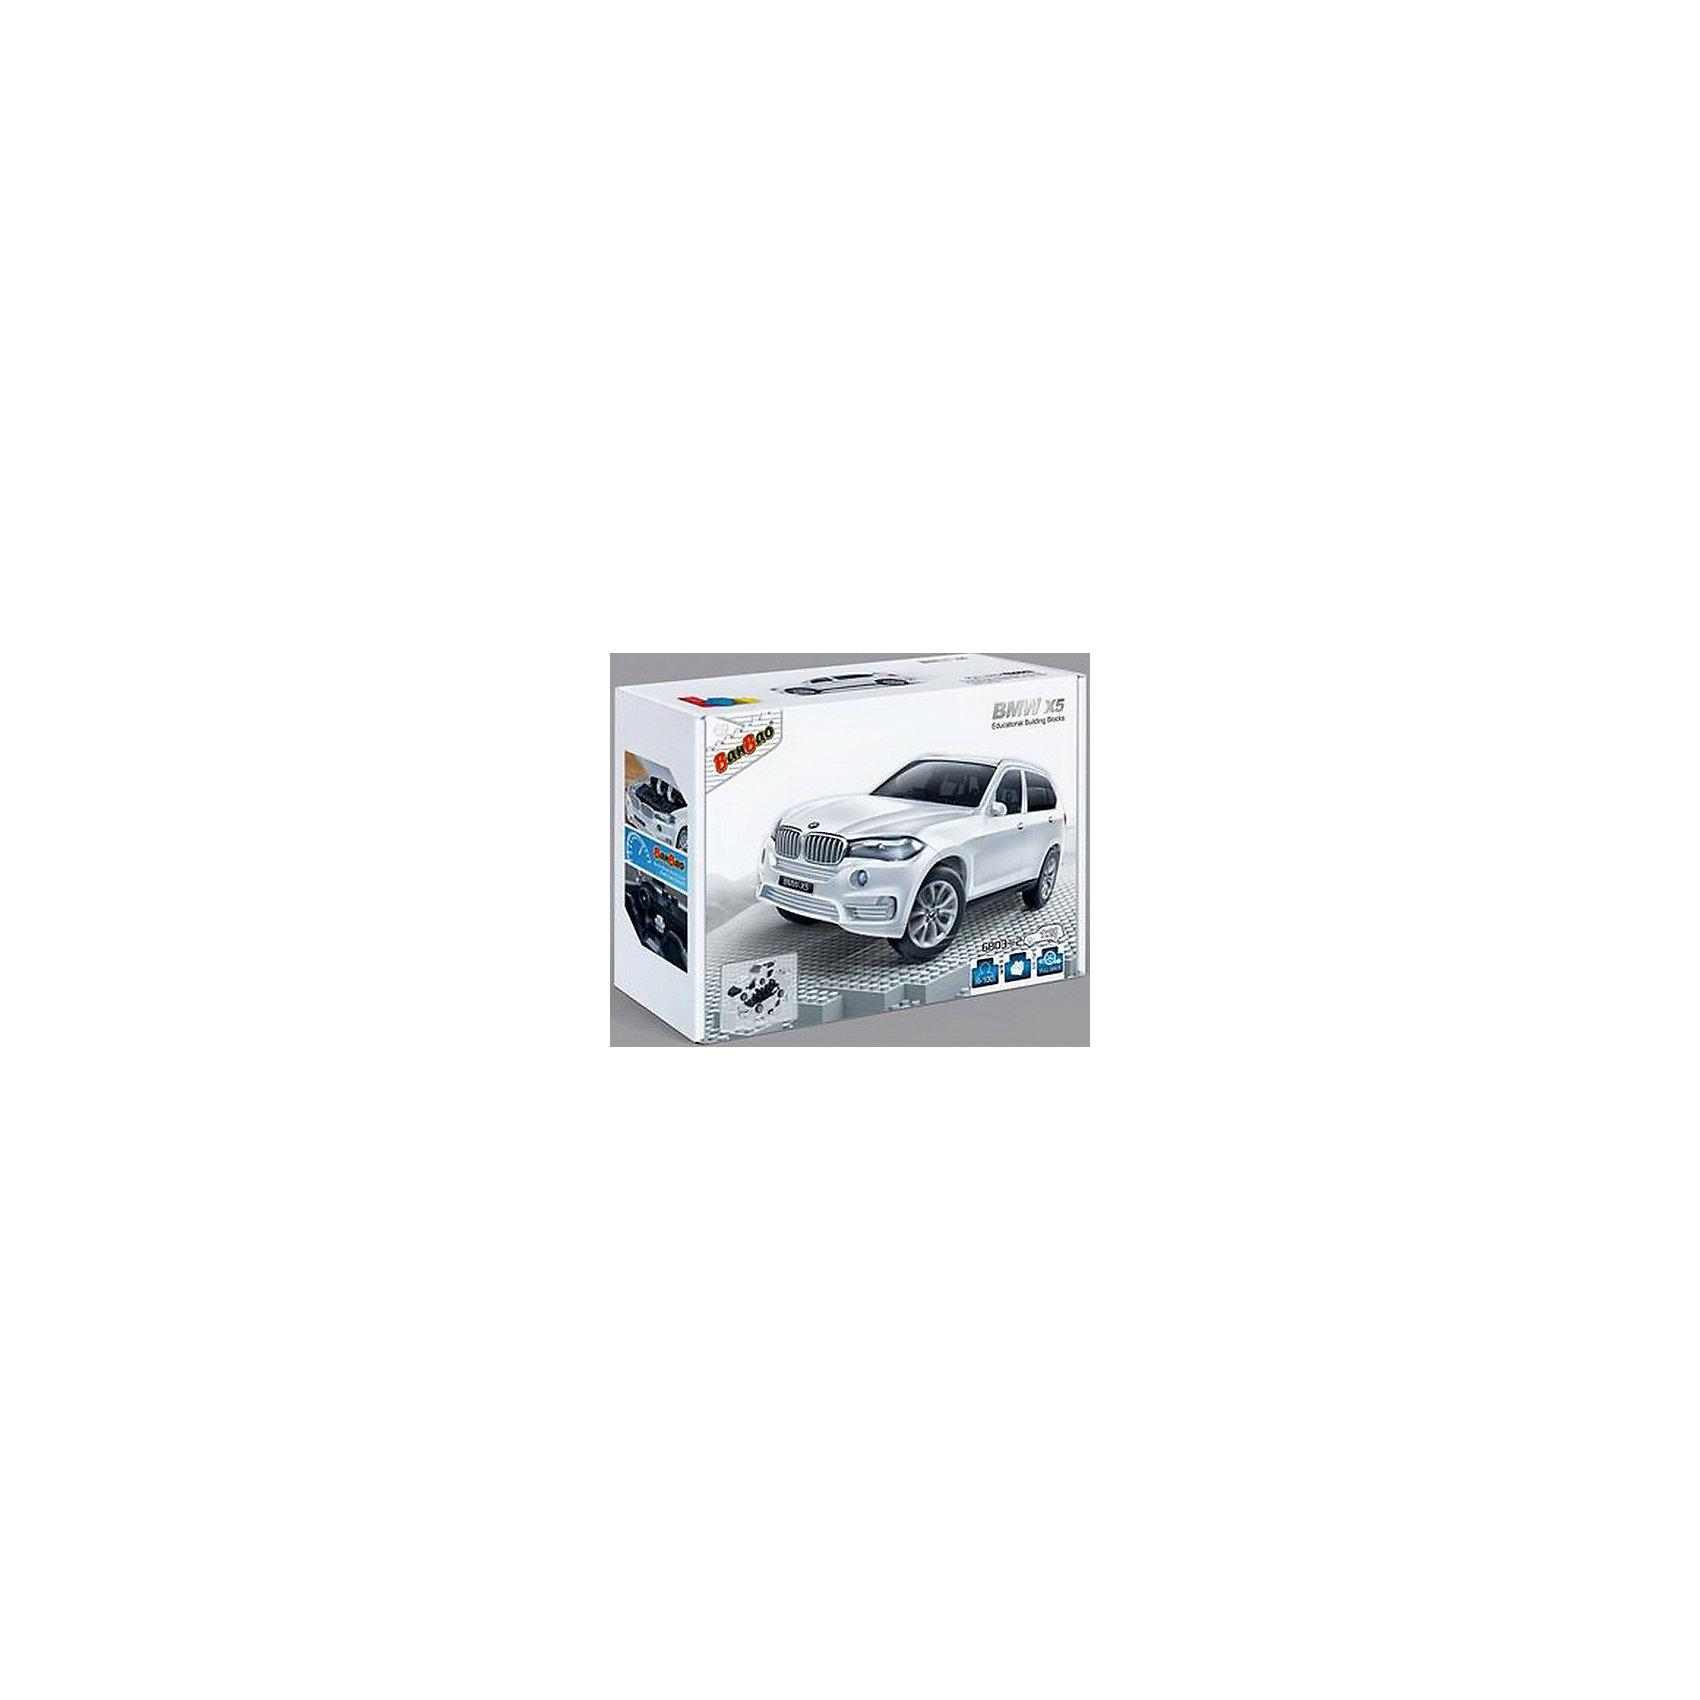 Конструктор Машина BMW X5, белый цвет, 1:28, BanBaoПластмассовые конструкторы<br>Конструктор Машина BMW X5 (белый цвет), масштаб 1:28, 26.5х18.5х8см<br><br>Ширина мм: 265<br>Глубина мм: 185<br>Высота мм: 80<br>Вес г: 500<br>Возраст от месяцев: 60<br>Возраст до месяцев: 1188<br>Пол: Мужской<br>Возраст: Детский<br>SKU: 5528491